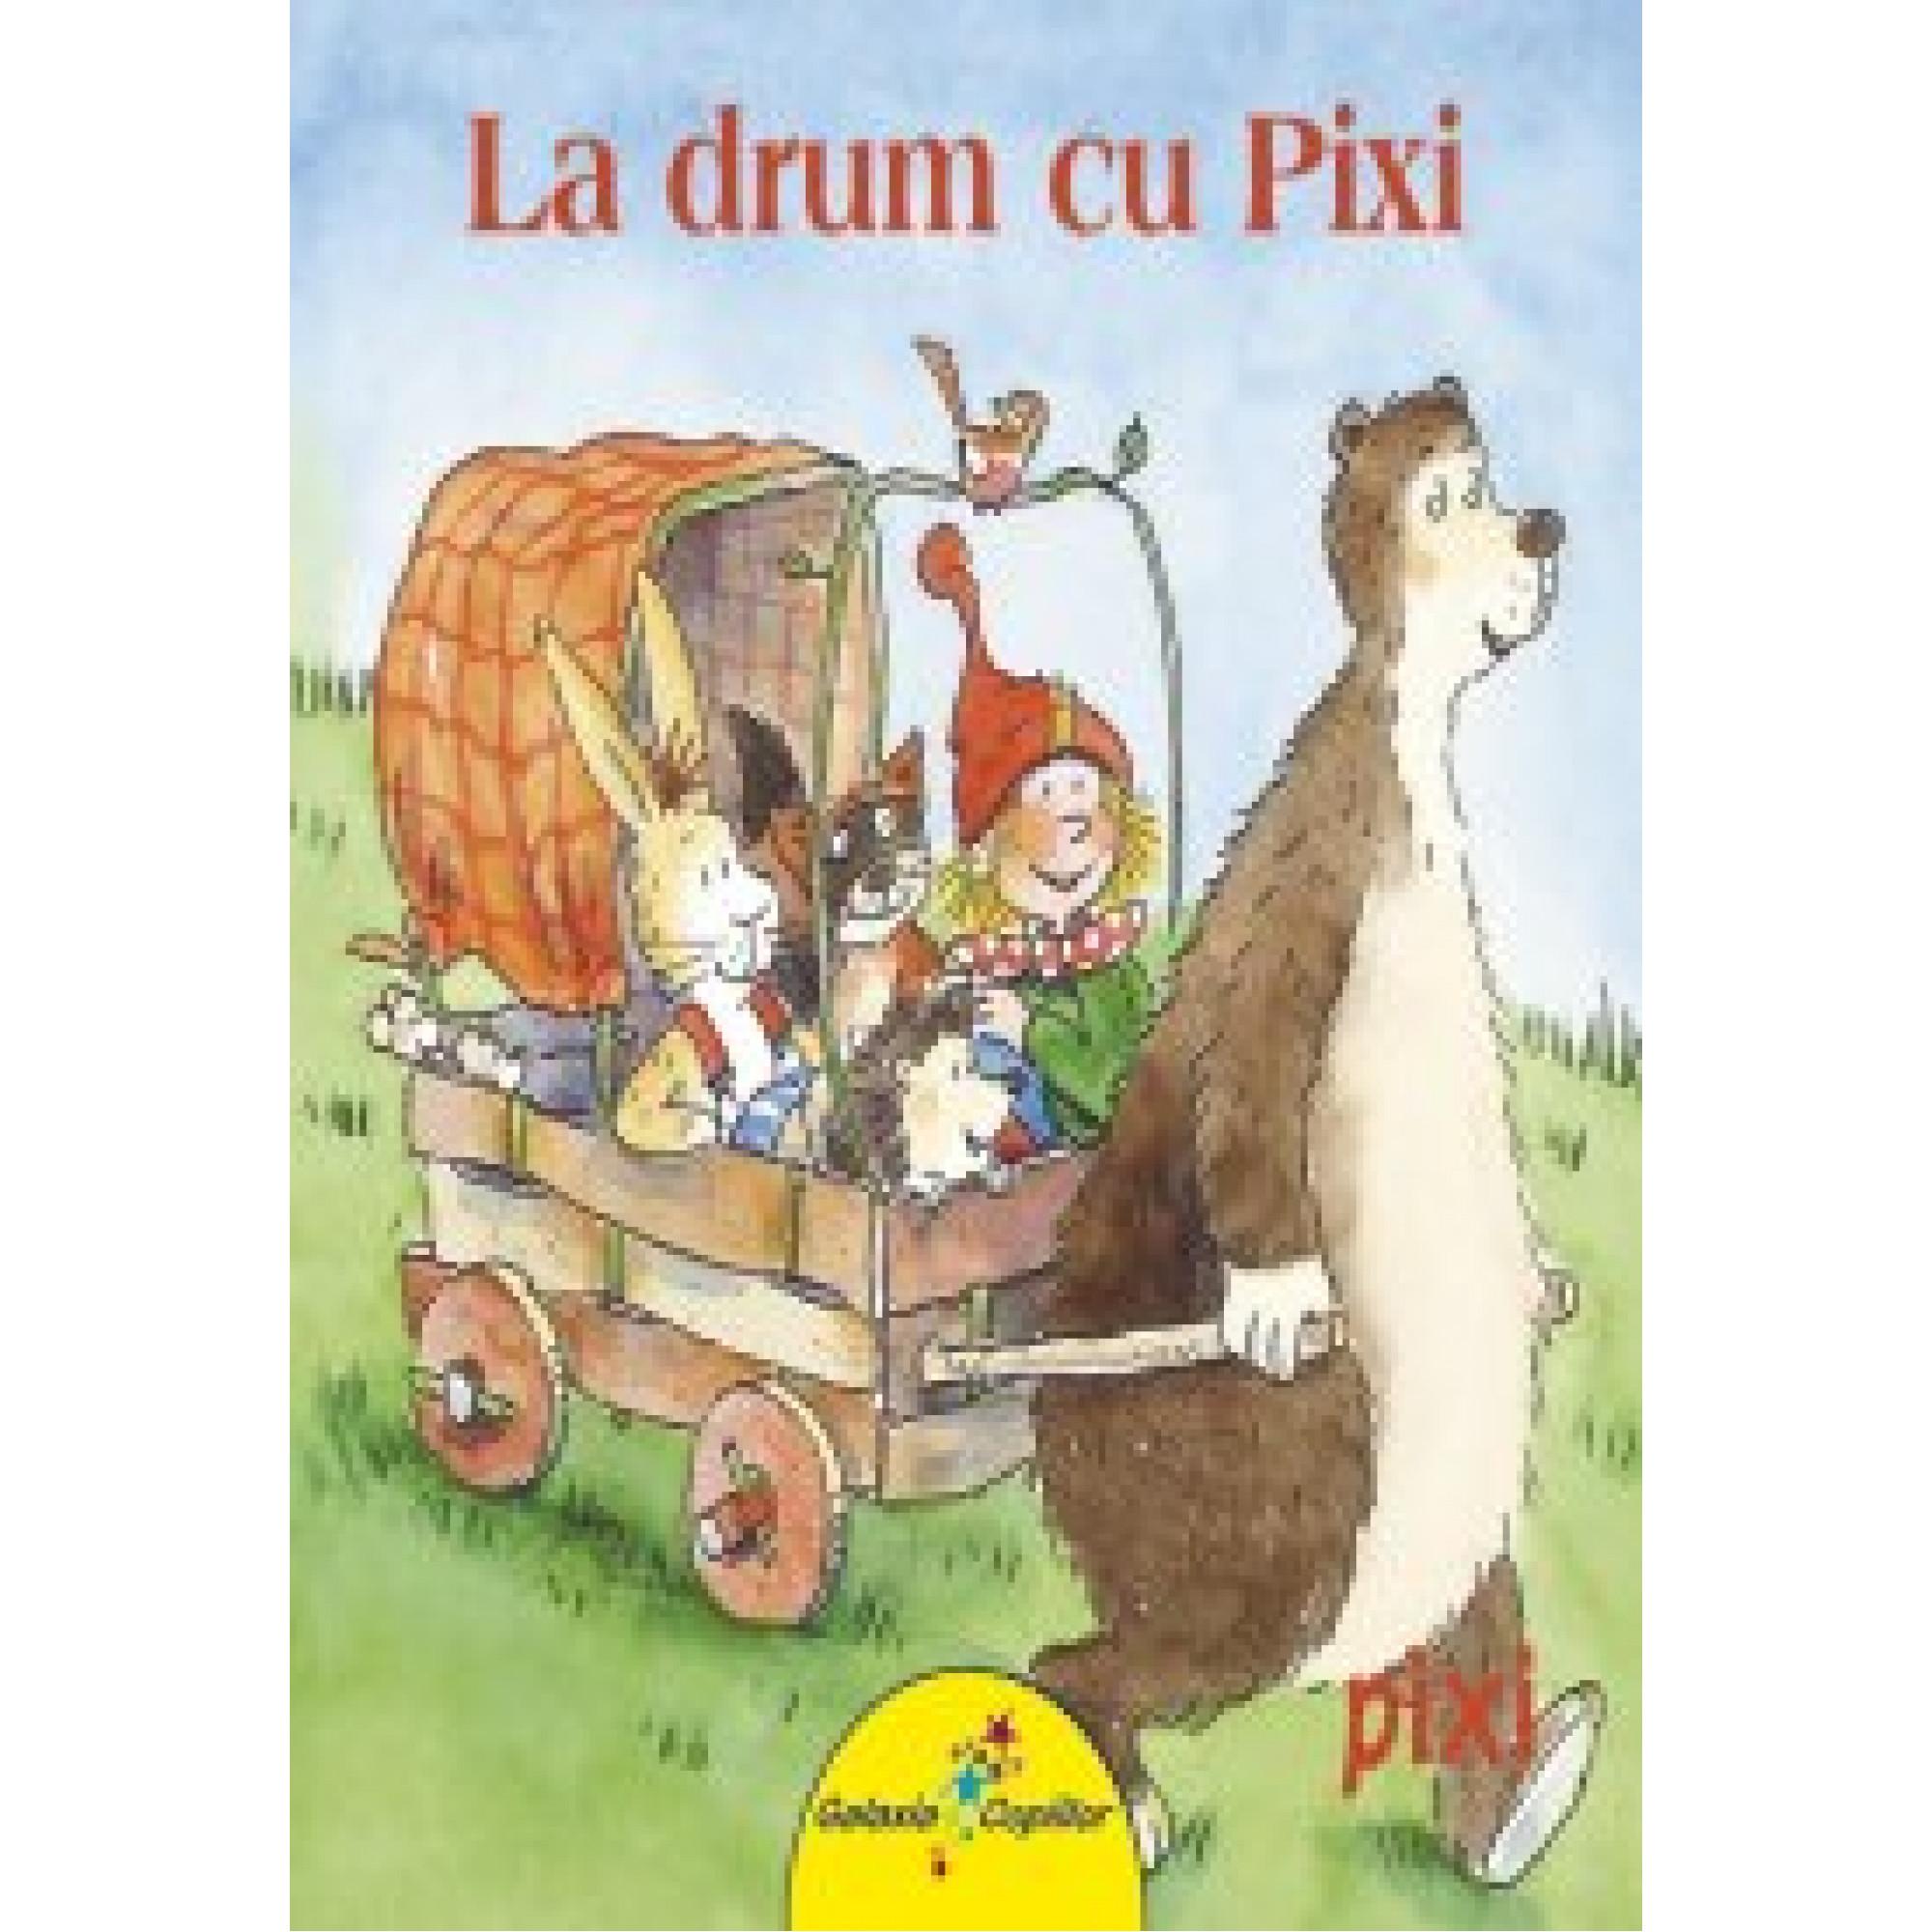 La drum cu Pixi; Simone Nettingsmeier